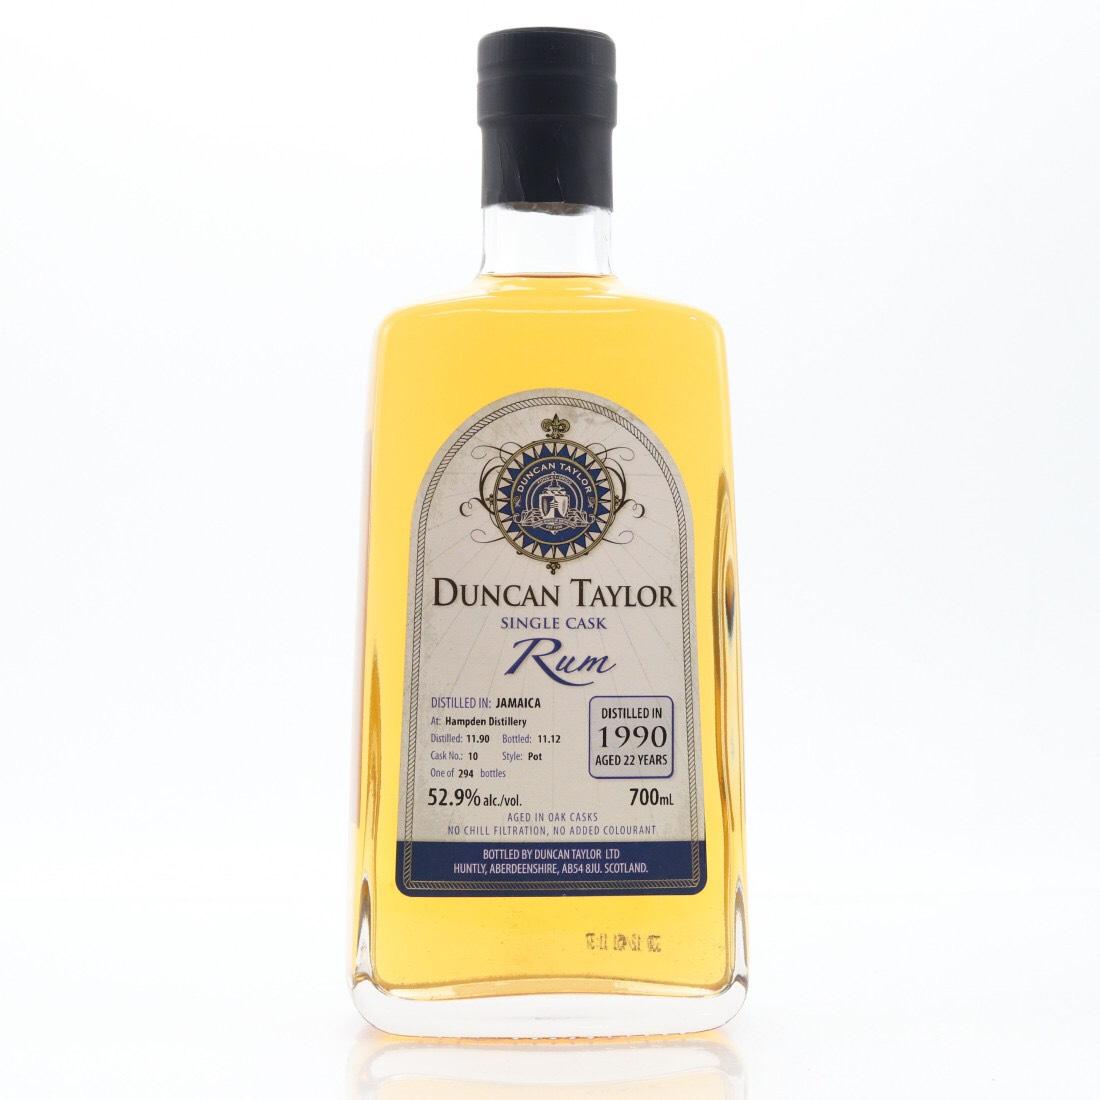 Bottle image of Single Cask Rum C<>H